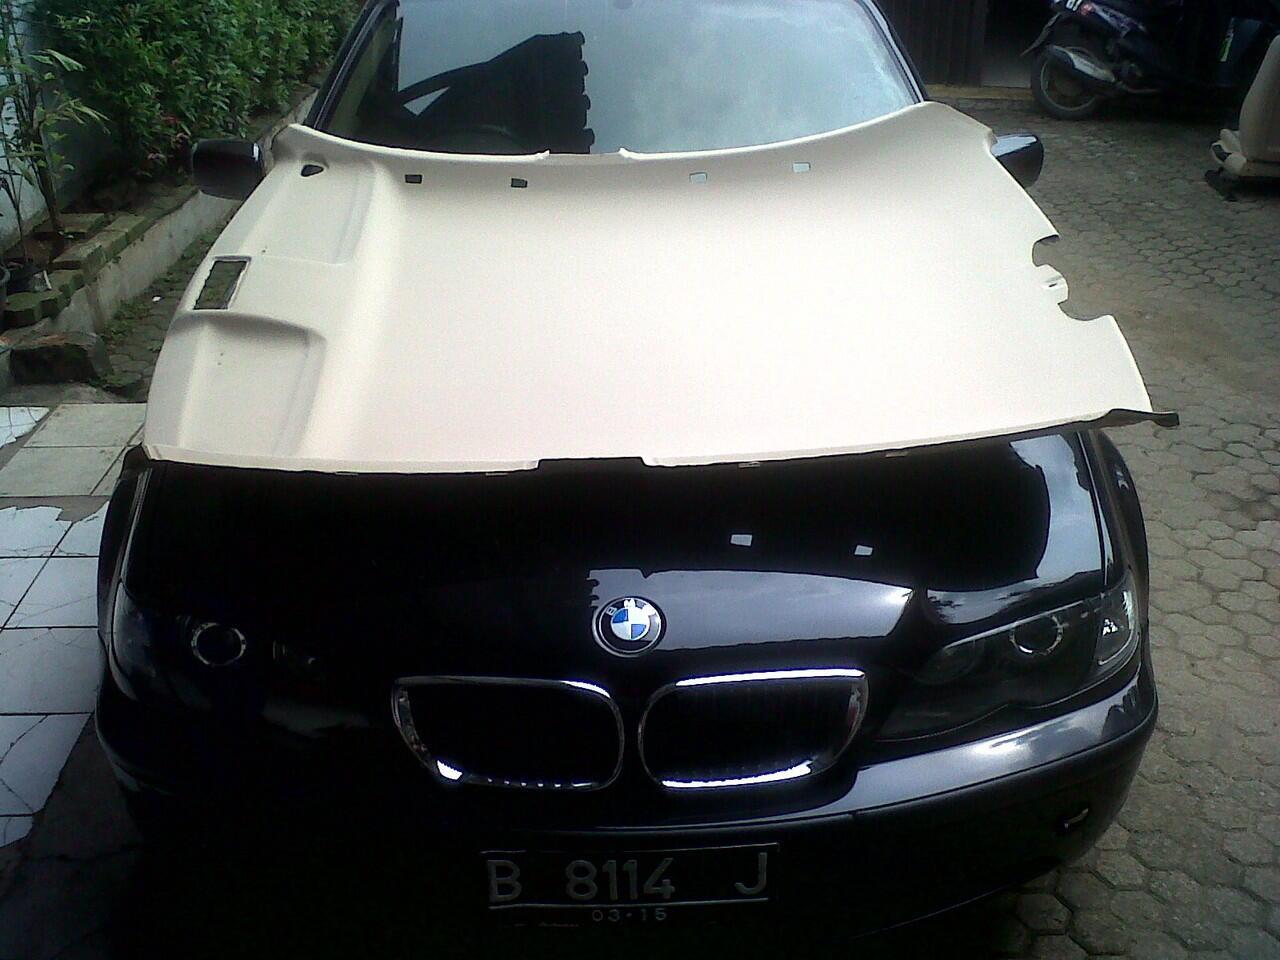 BMW service speciaist perbaikan plafon mobil @ jakarta, depok. www.plafonbmw.com